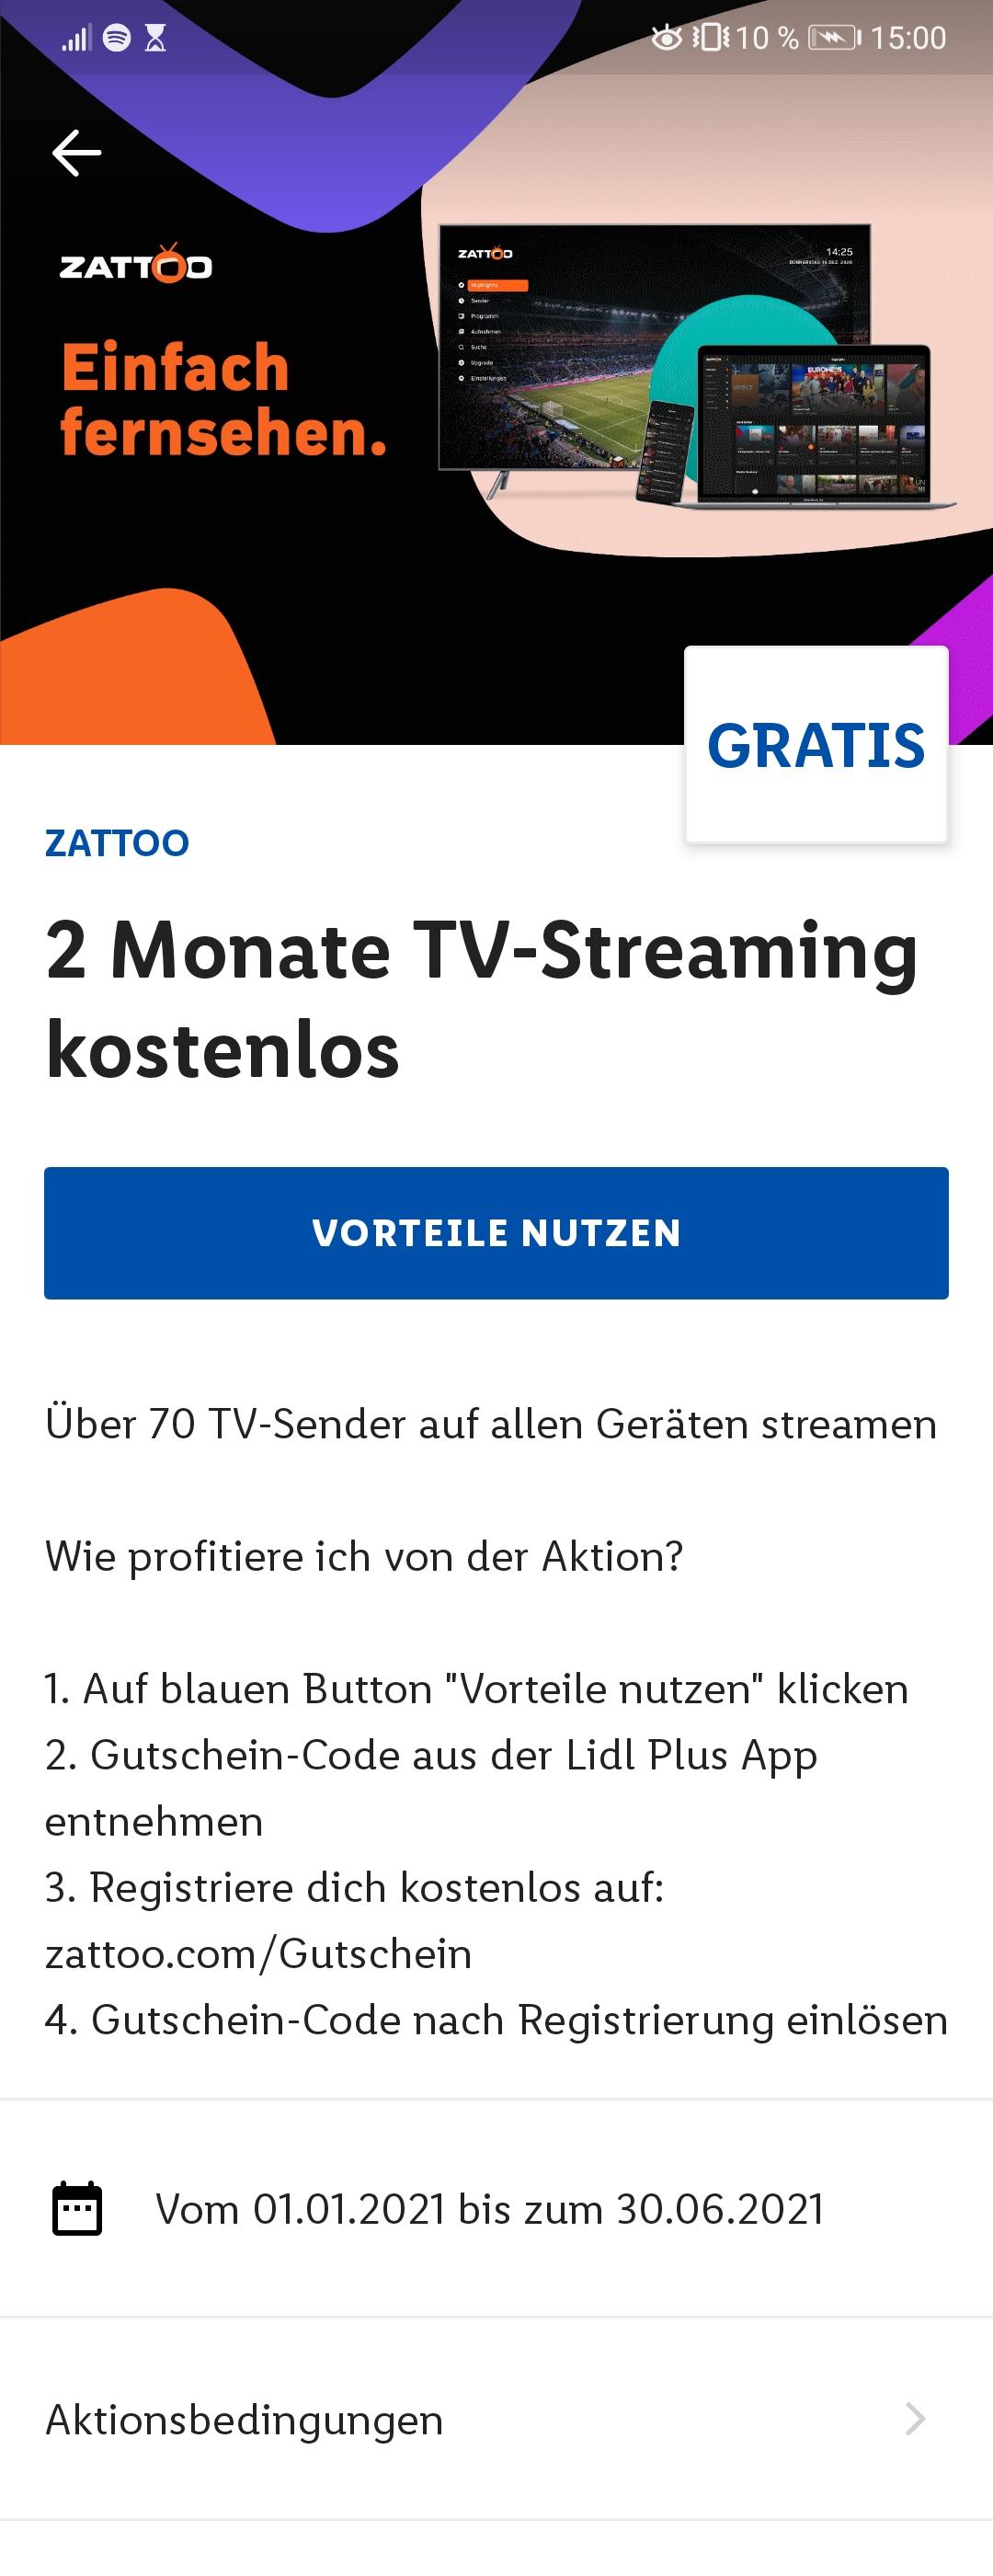 Lidl Plus App: 2 Monate Zattoo Ultimate gratis (TV-Streaming)